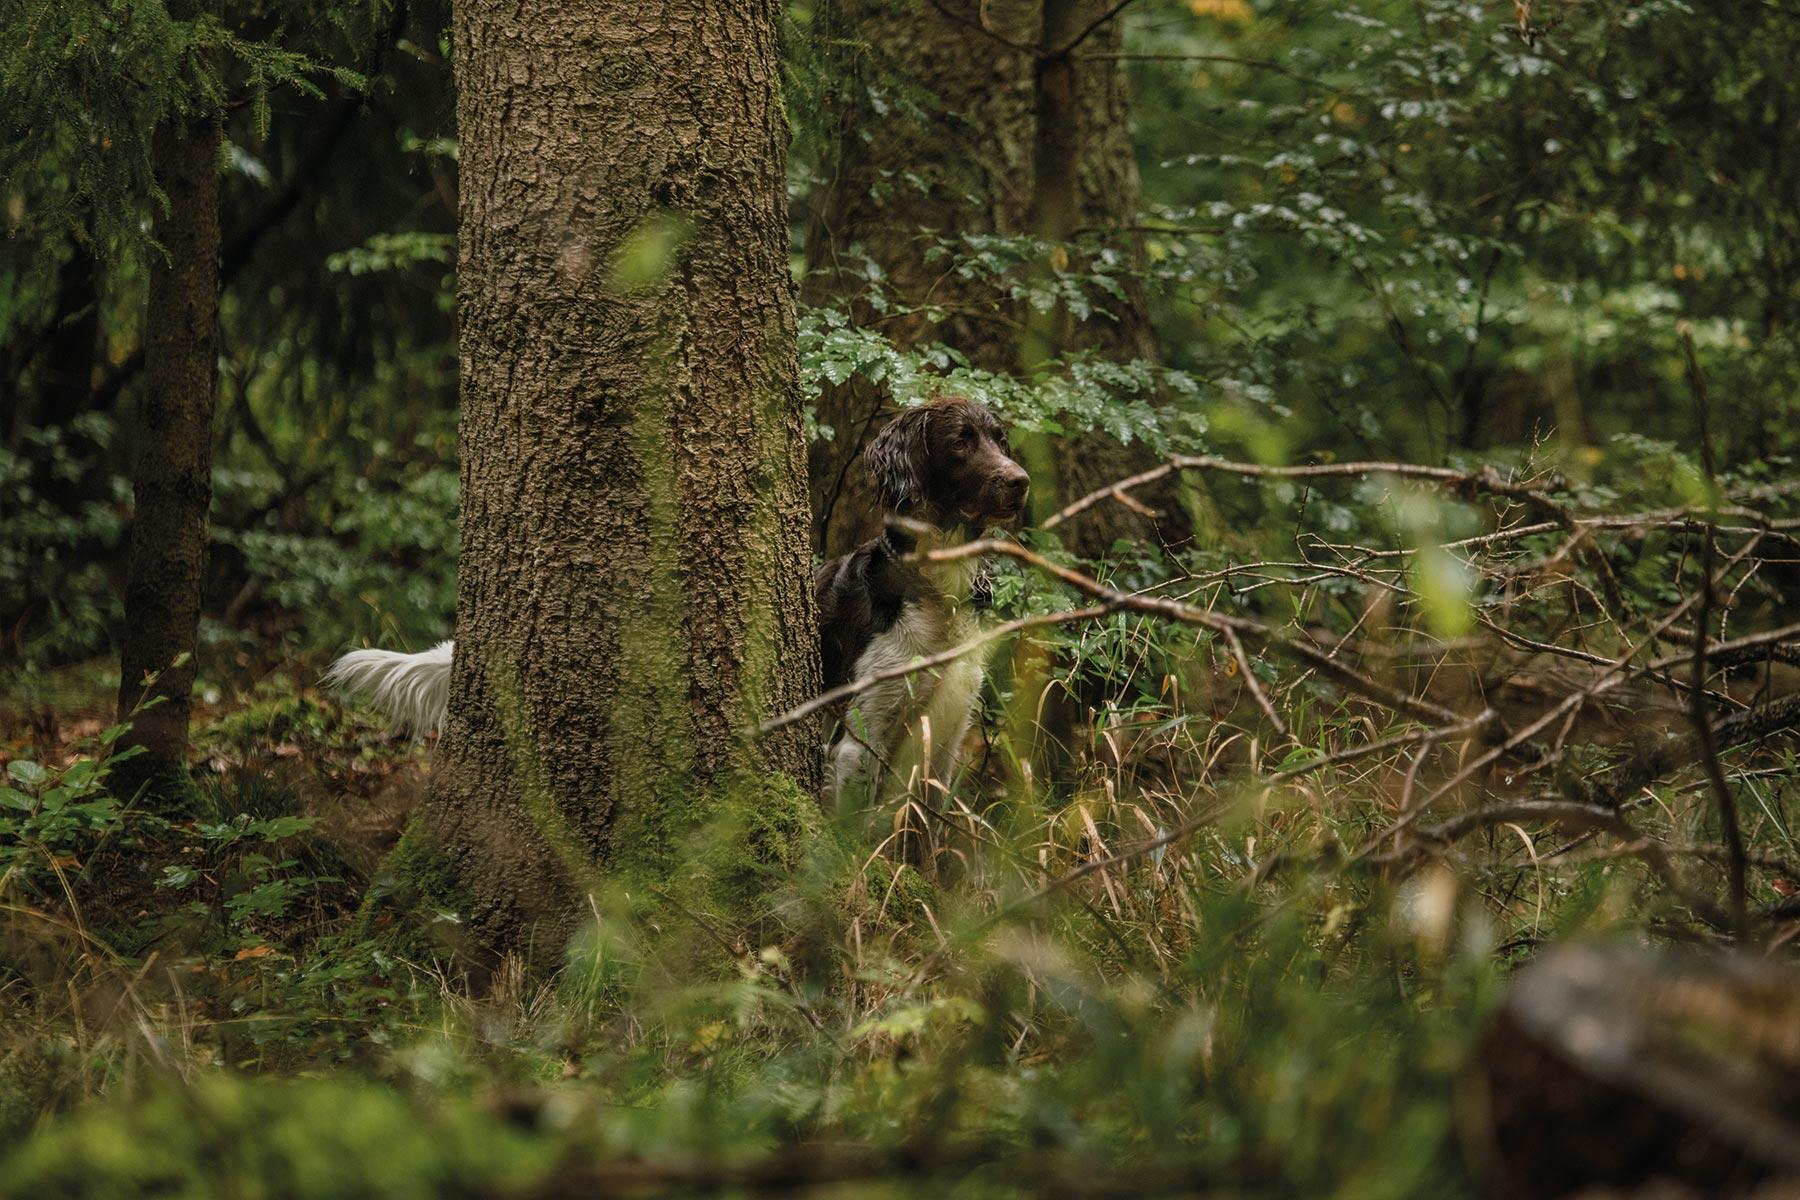 kleiner-muensterlaender-hund-tierfilm-wald-doku-outdoor-hundefilm-jagdhund-basti-kaspar